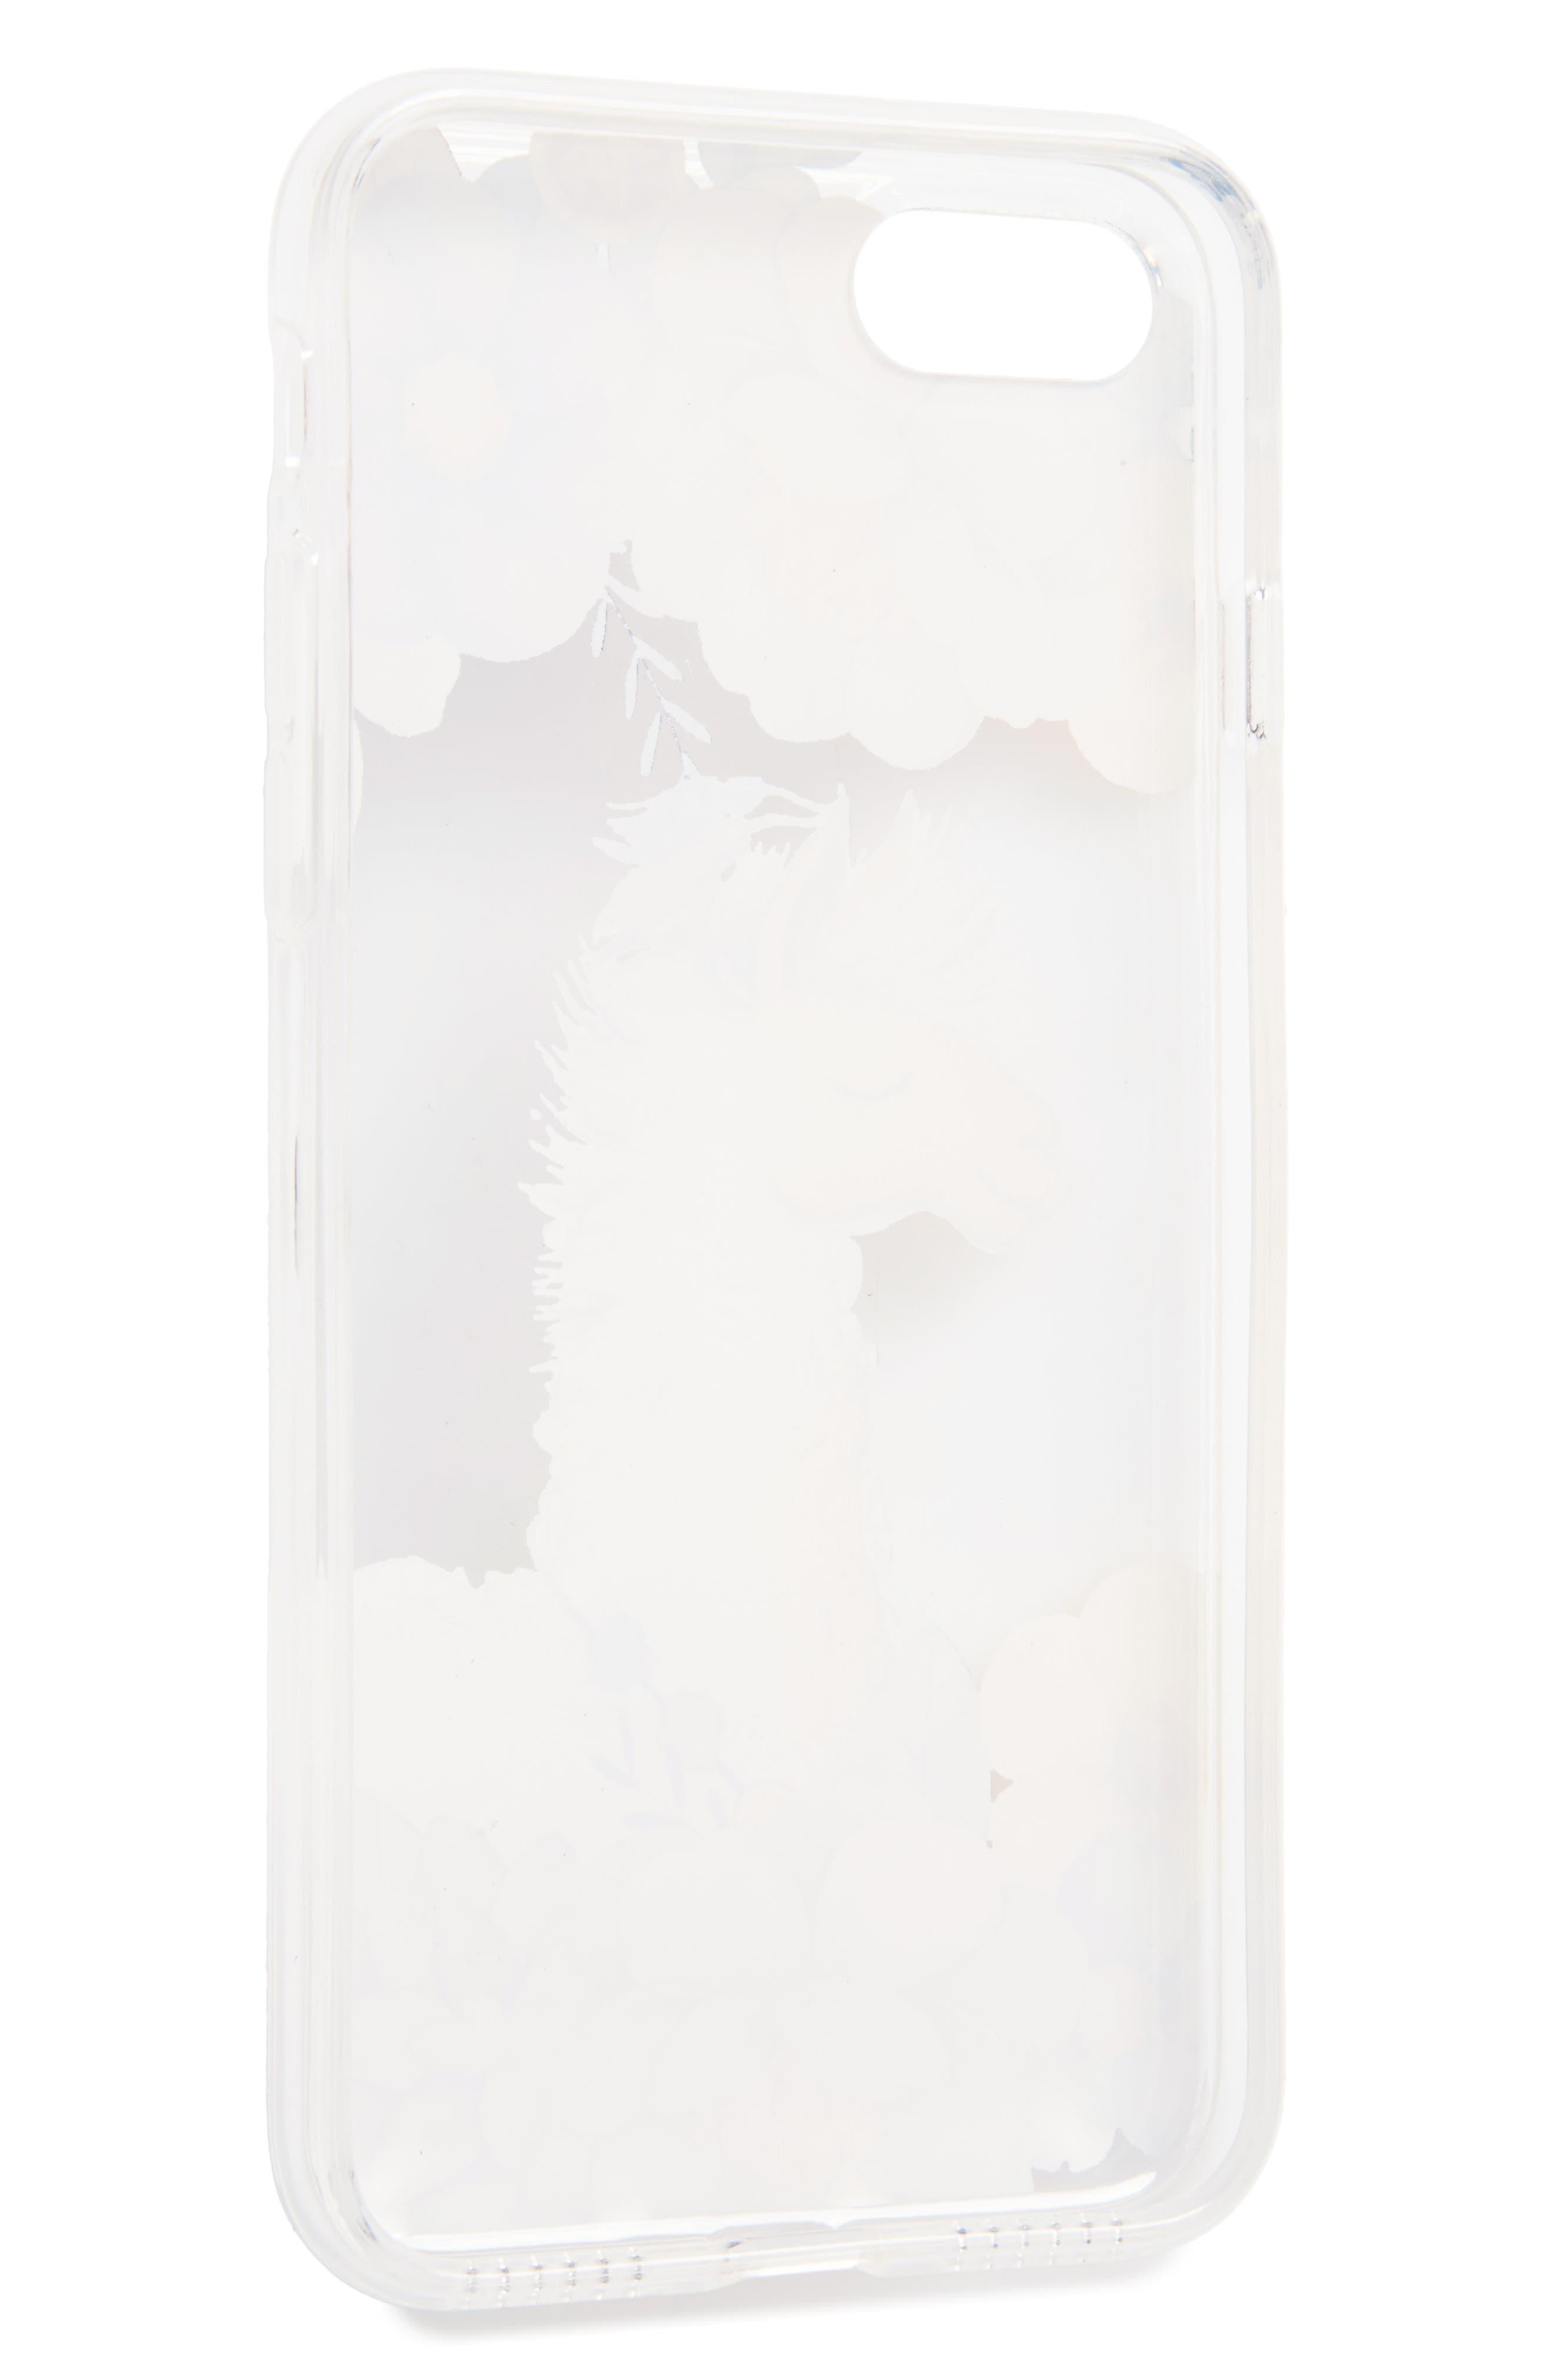 Llama iPhone 7 Case,                             Alternate thumbnail 2, color,                             100